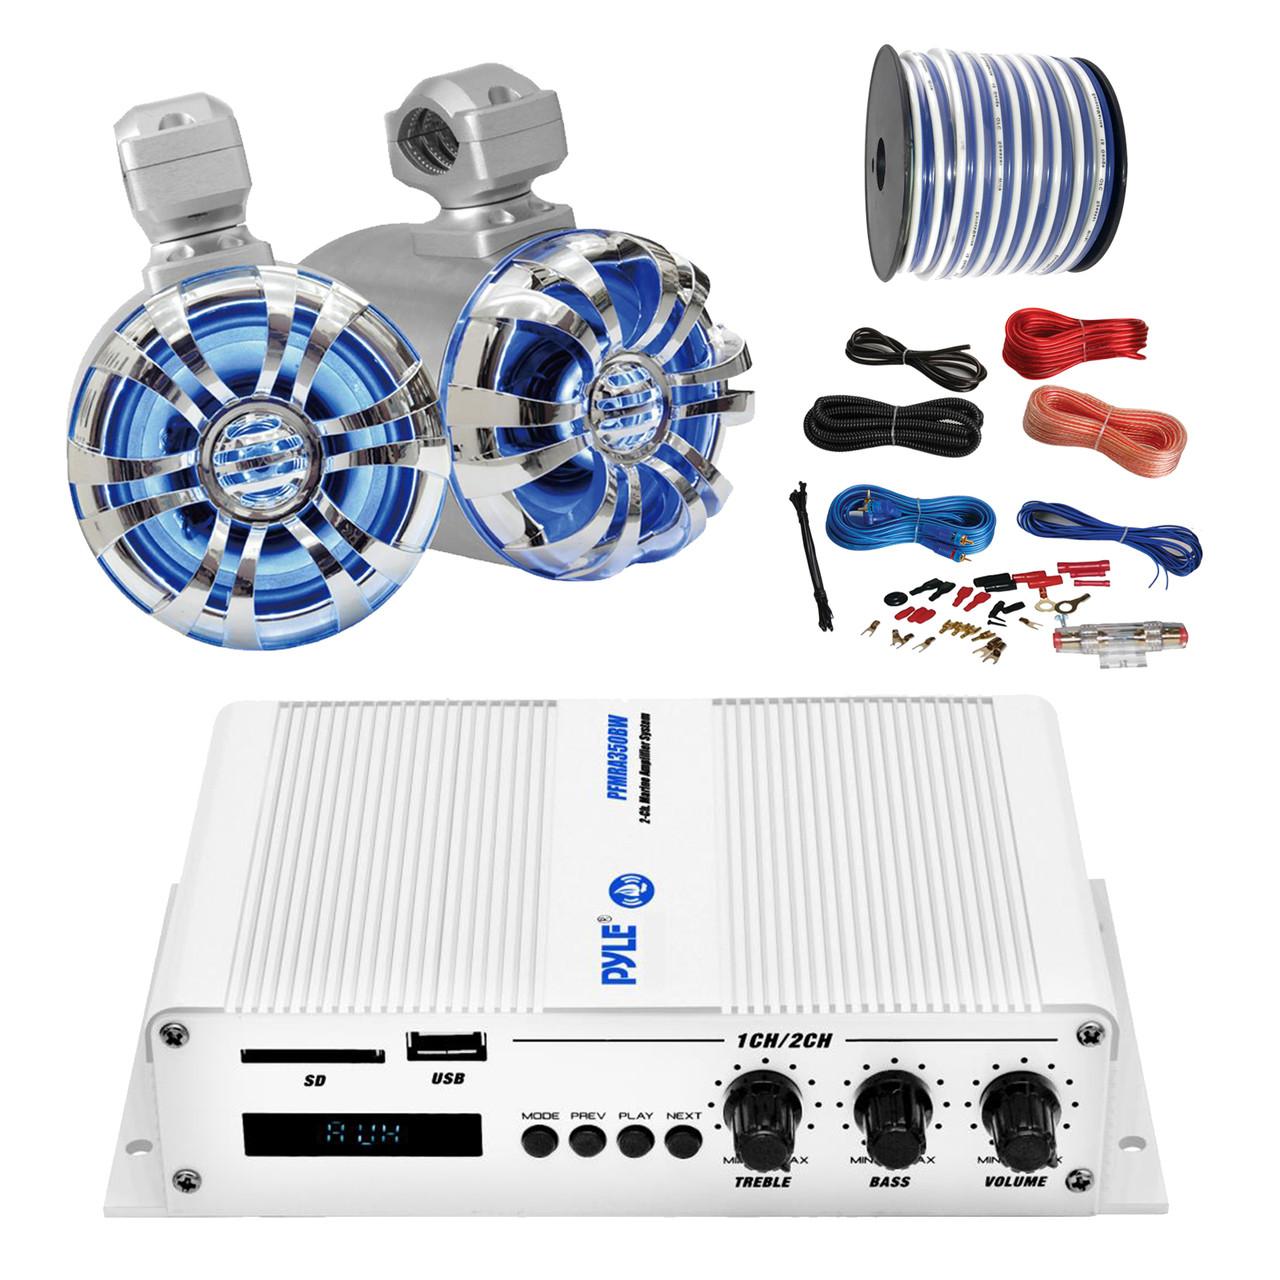 Pyle Marine PFMRA350BW 2-Channel Bluetooth White Amplifier, Pyle 6.5